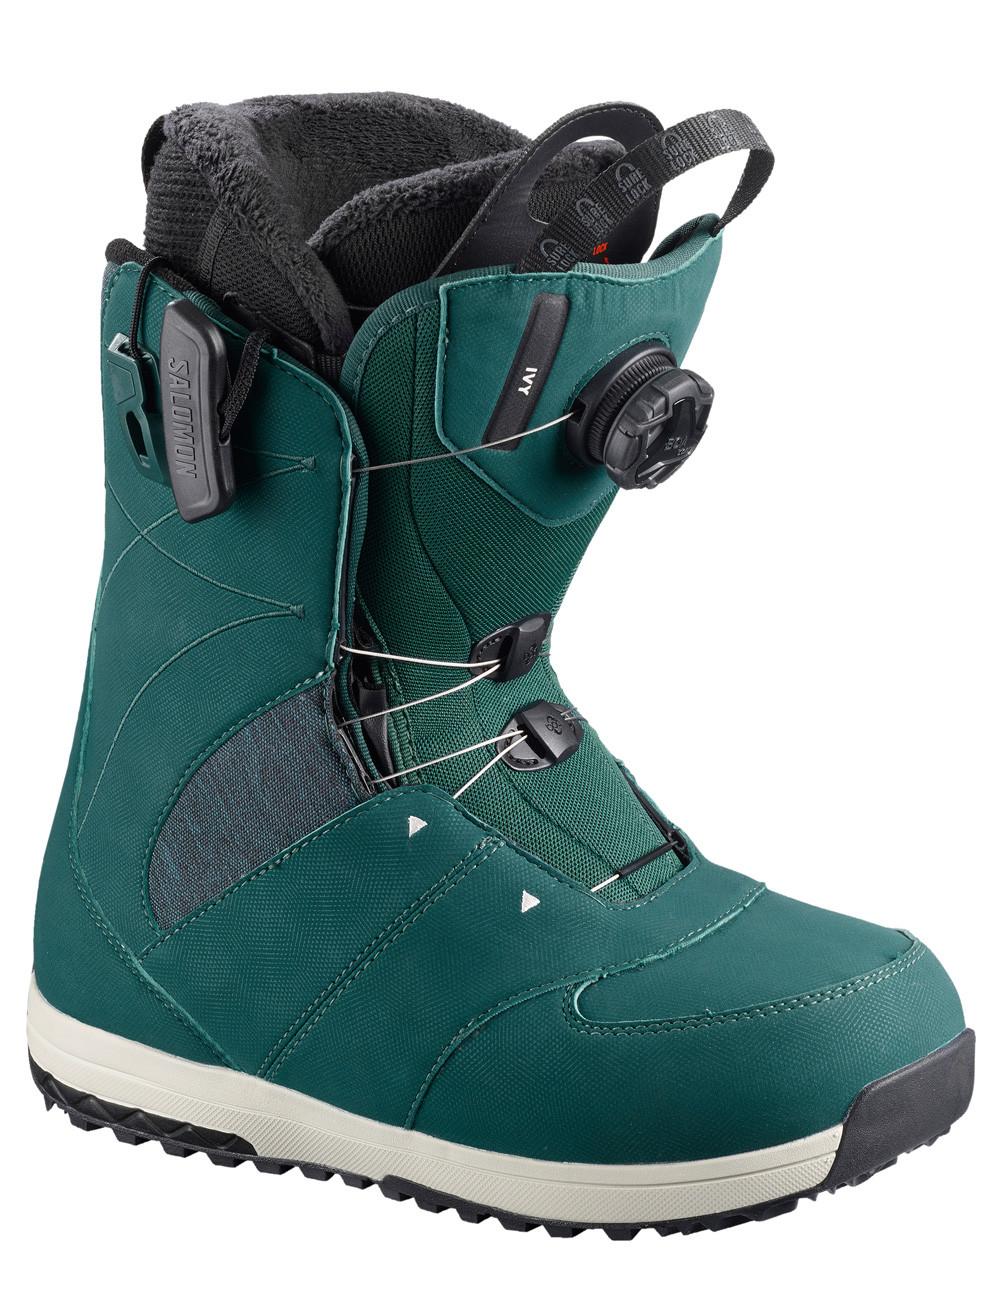 Buty snowboardowe Salomon IVY BOA